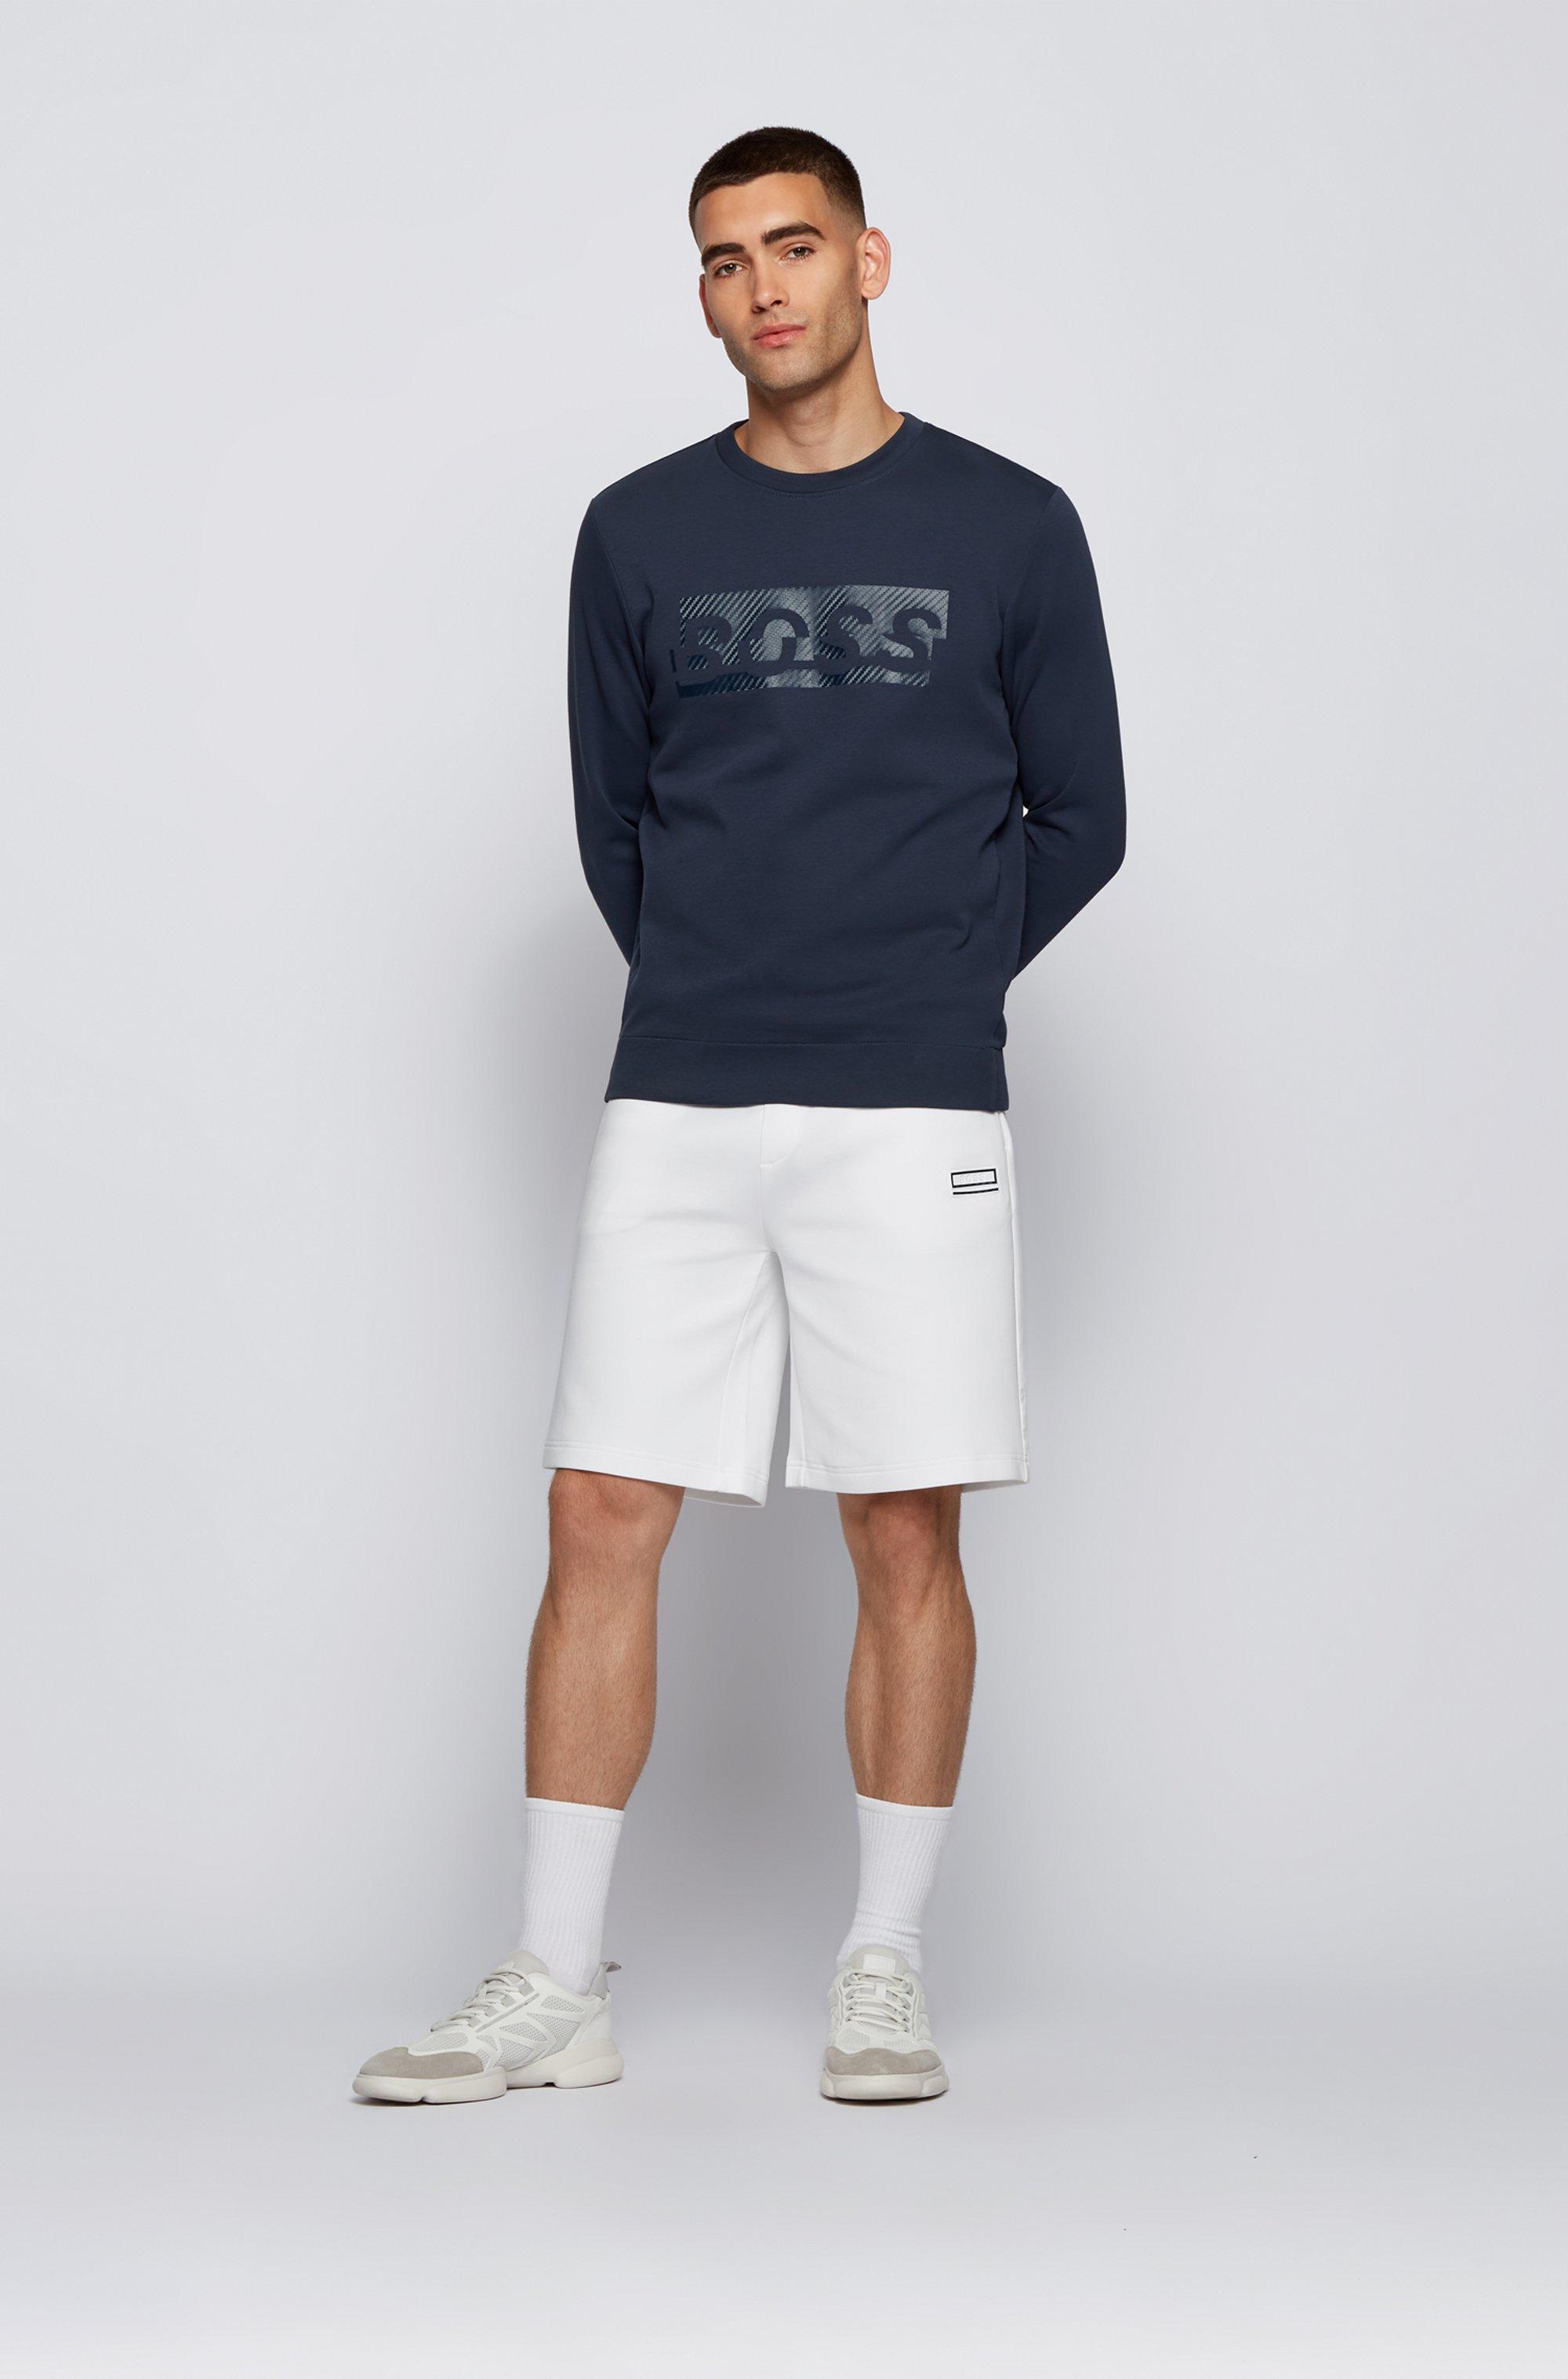 Slim-fit sweatshirt with carbon-effect printed logo